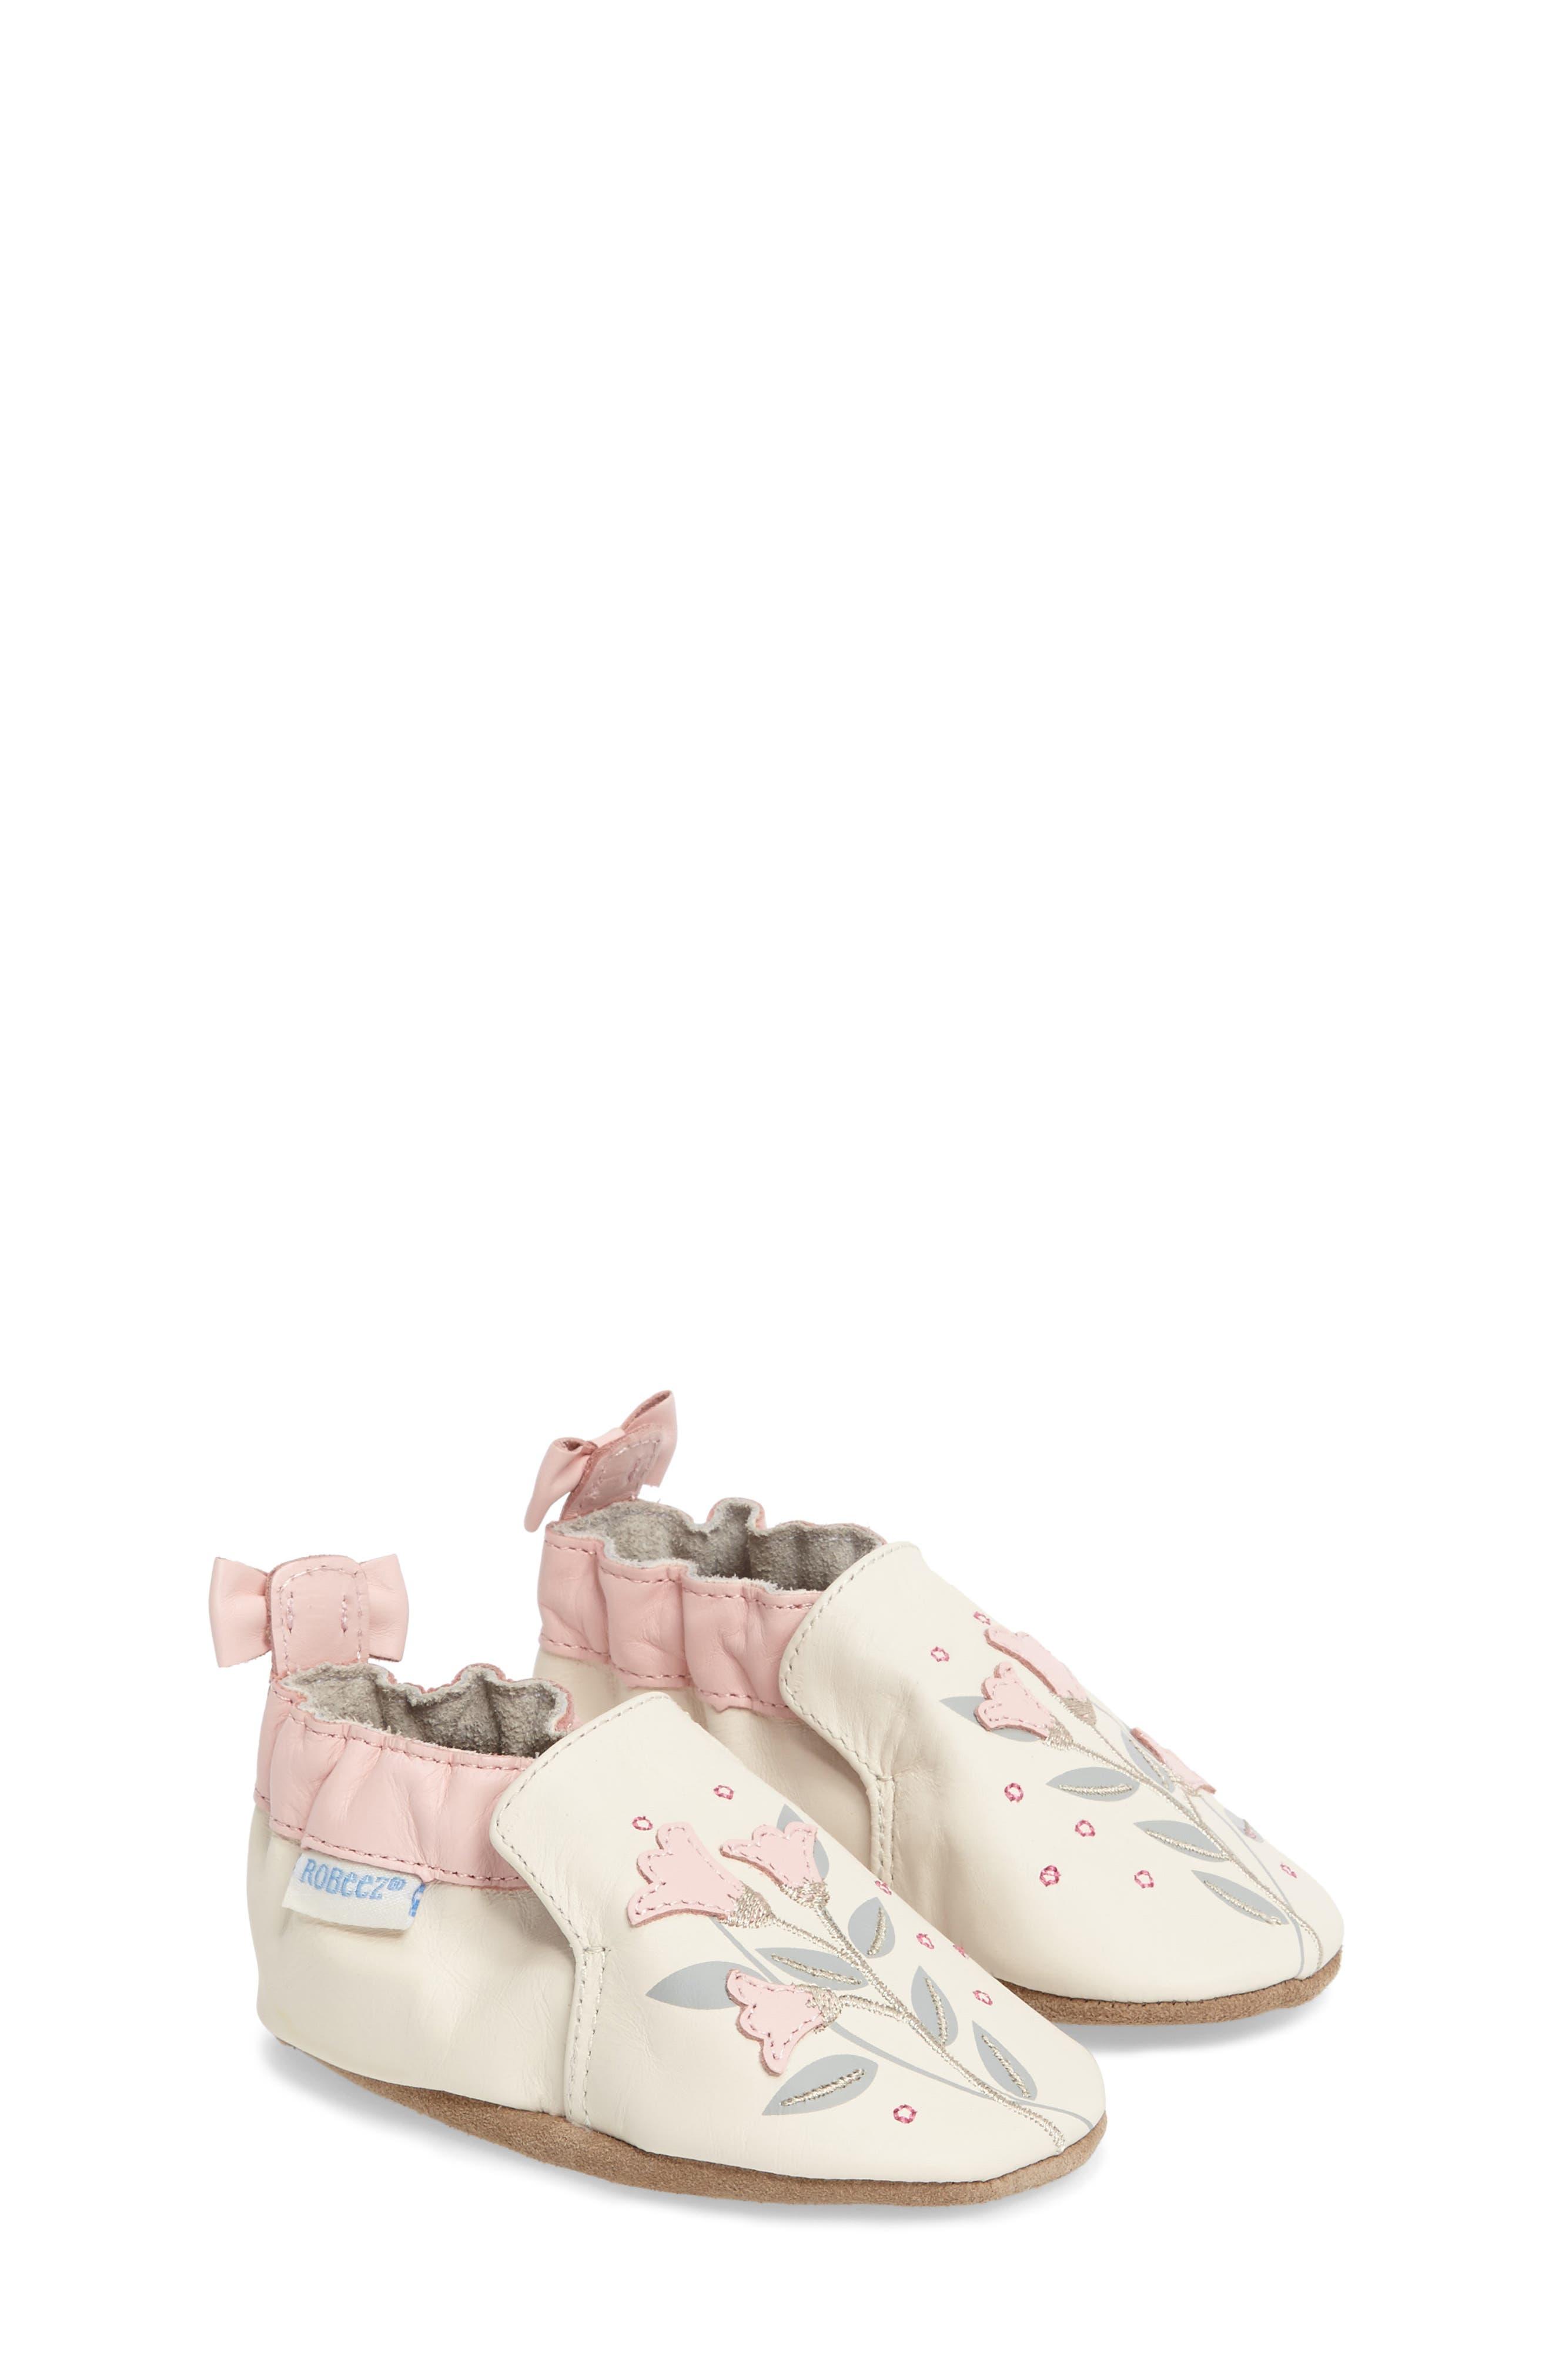 Rosealean Crib Shoe,                         Main,                         color, 650